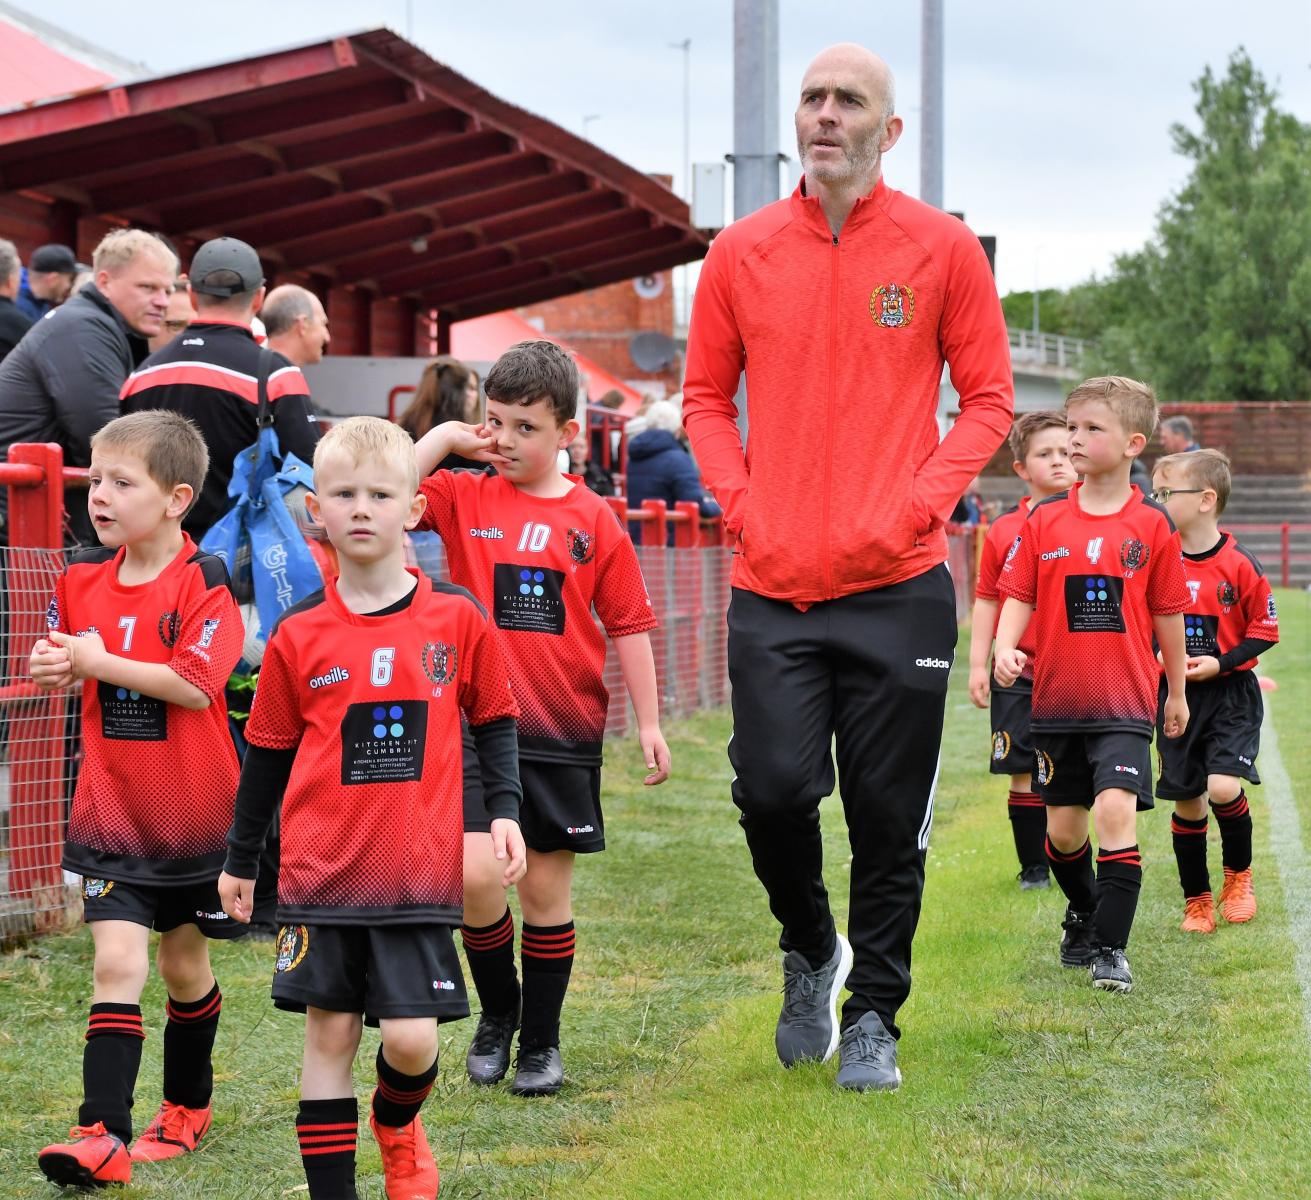 Reds Festival of Football – Juniors on the sponsored walk